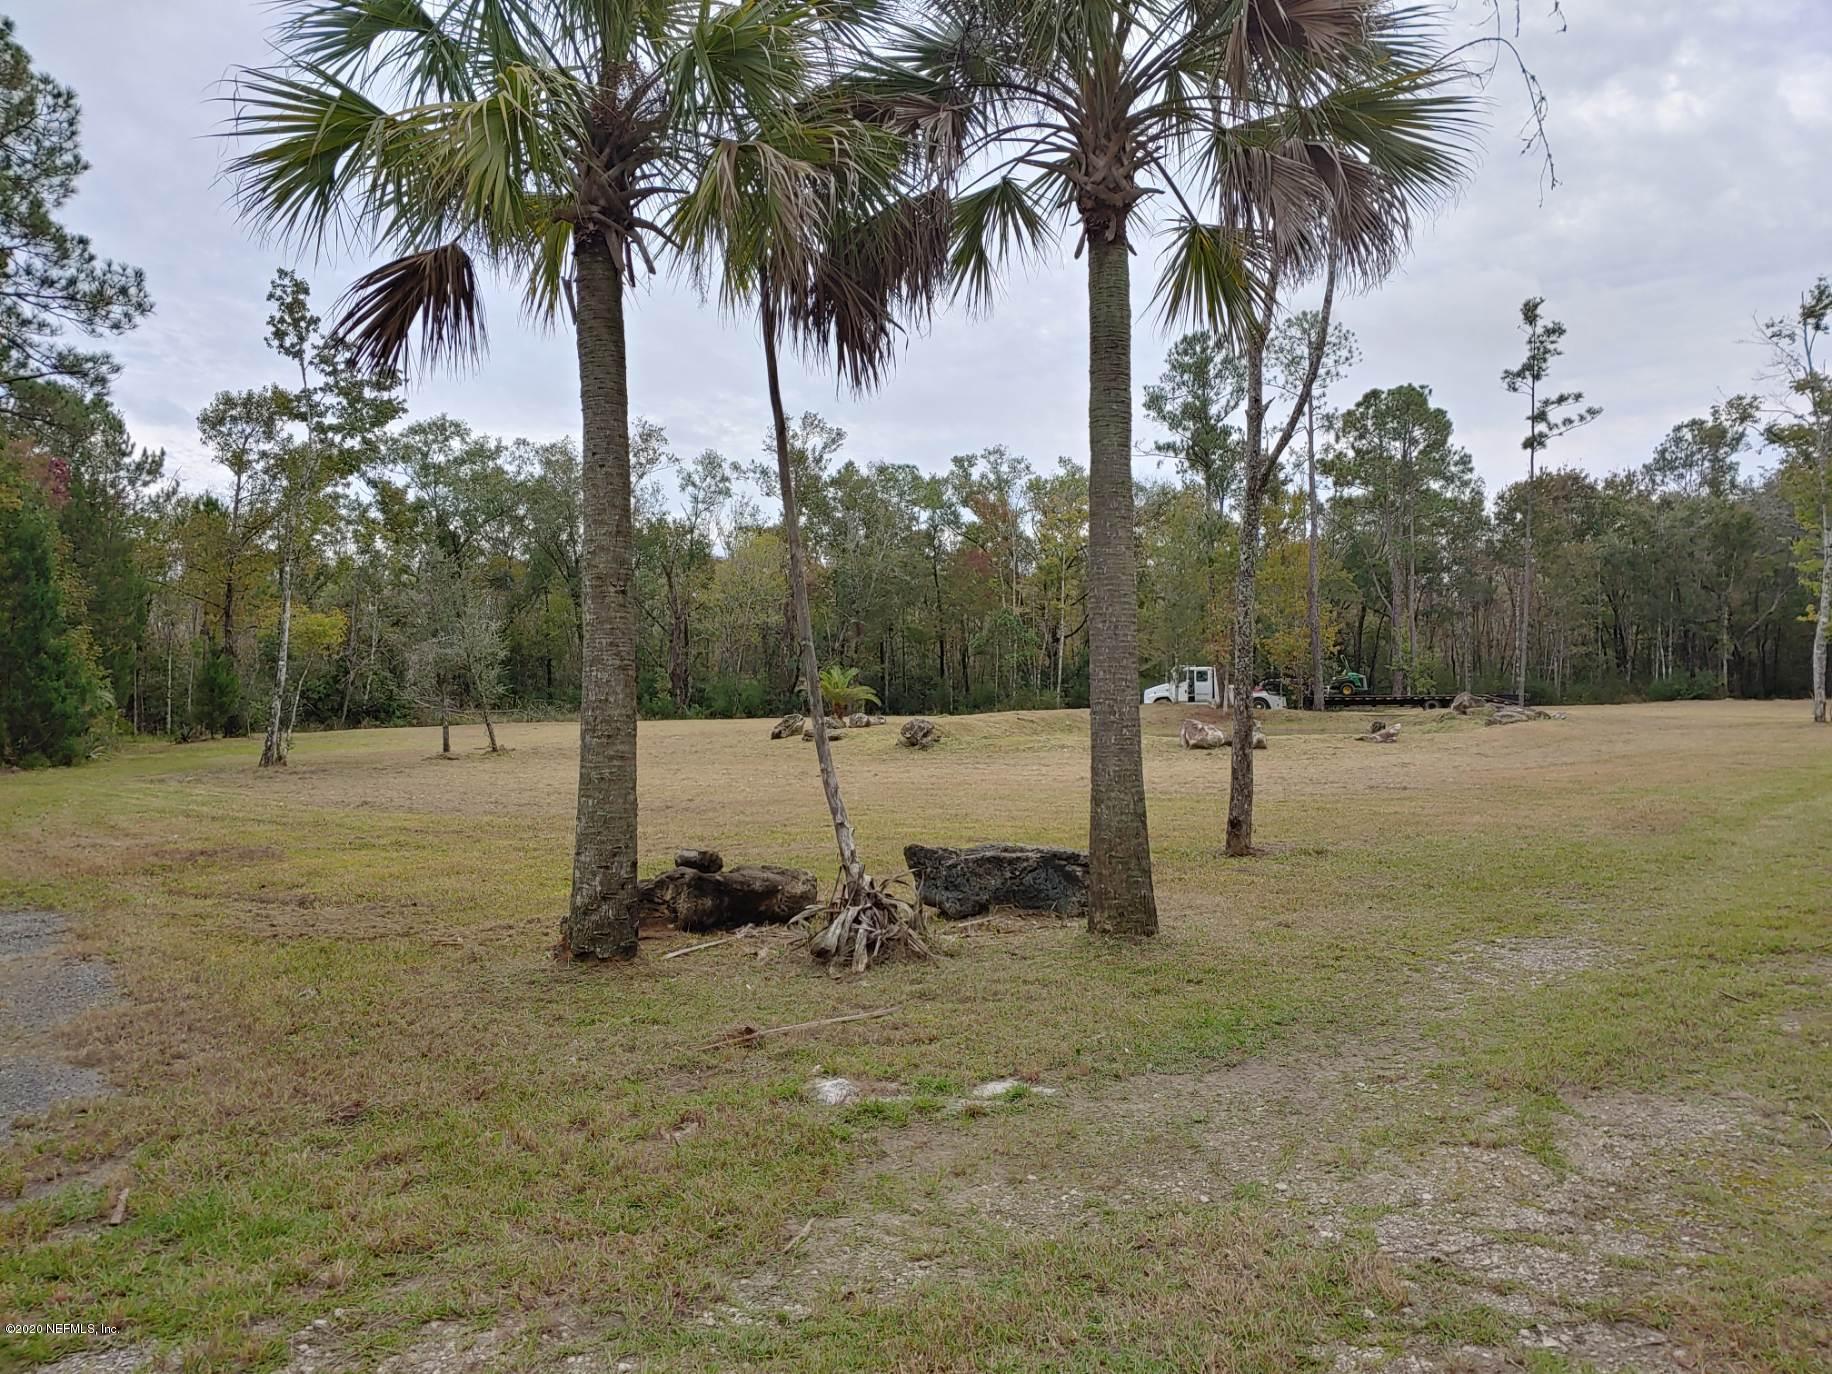 0 LANDWARD, MIDDLEBURG, FLORIDA 32068, ,Vacant land,For sale,LANDWARD,1059879